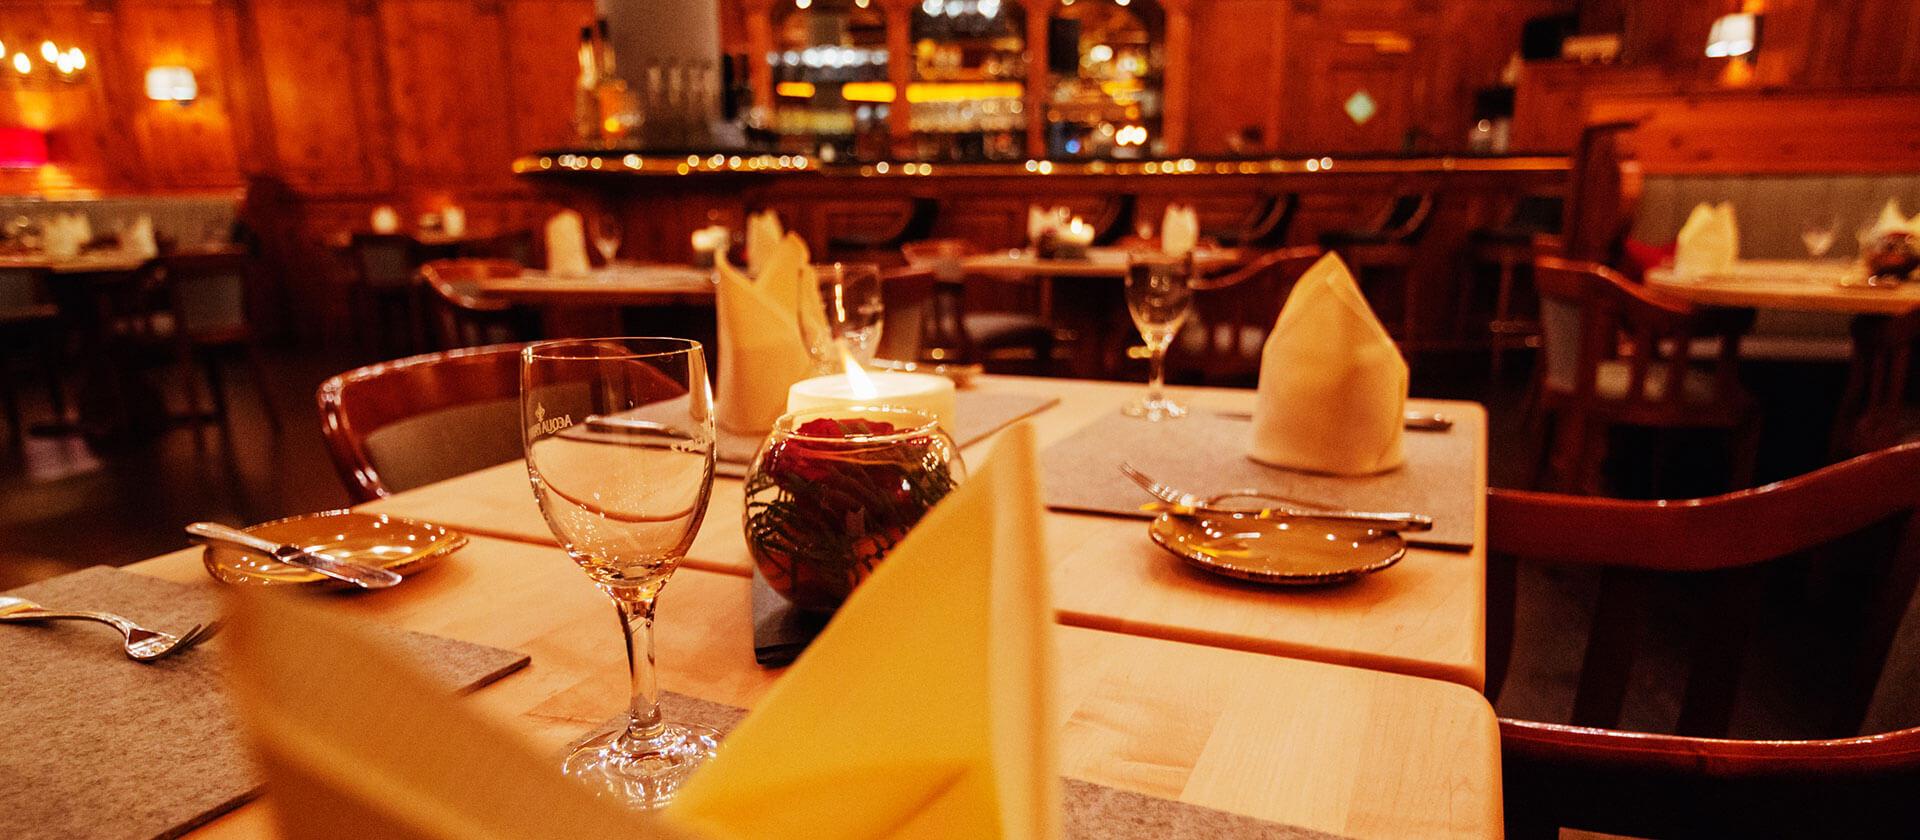 Das Restaurant Zirbelstube im Hotel VILA VITA Marburg